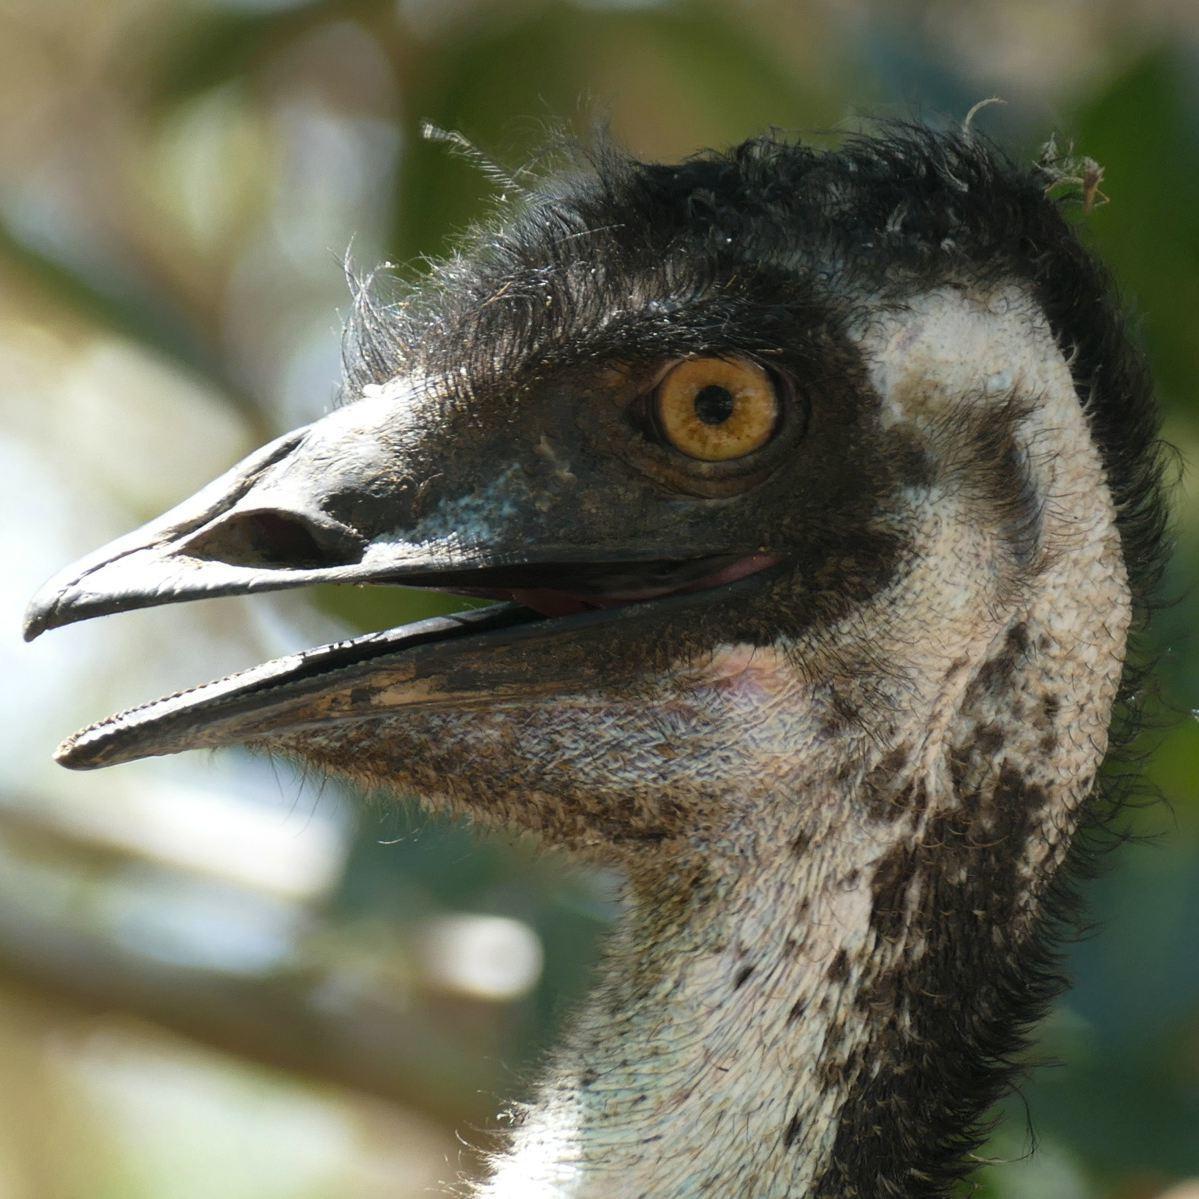 An Emu at the Mareeba Wetlands Reserve. Noah Strycker